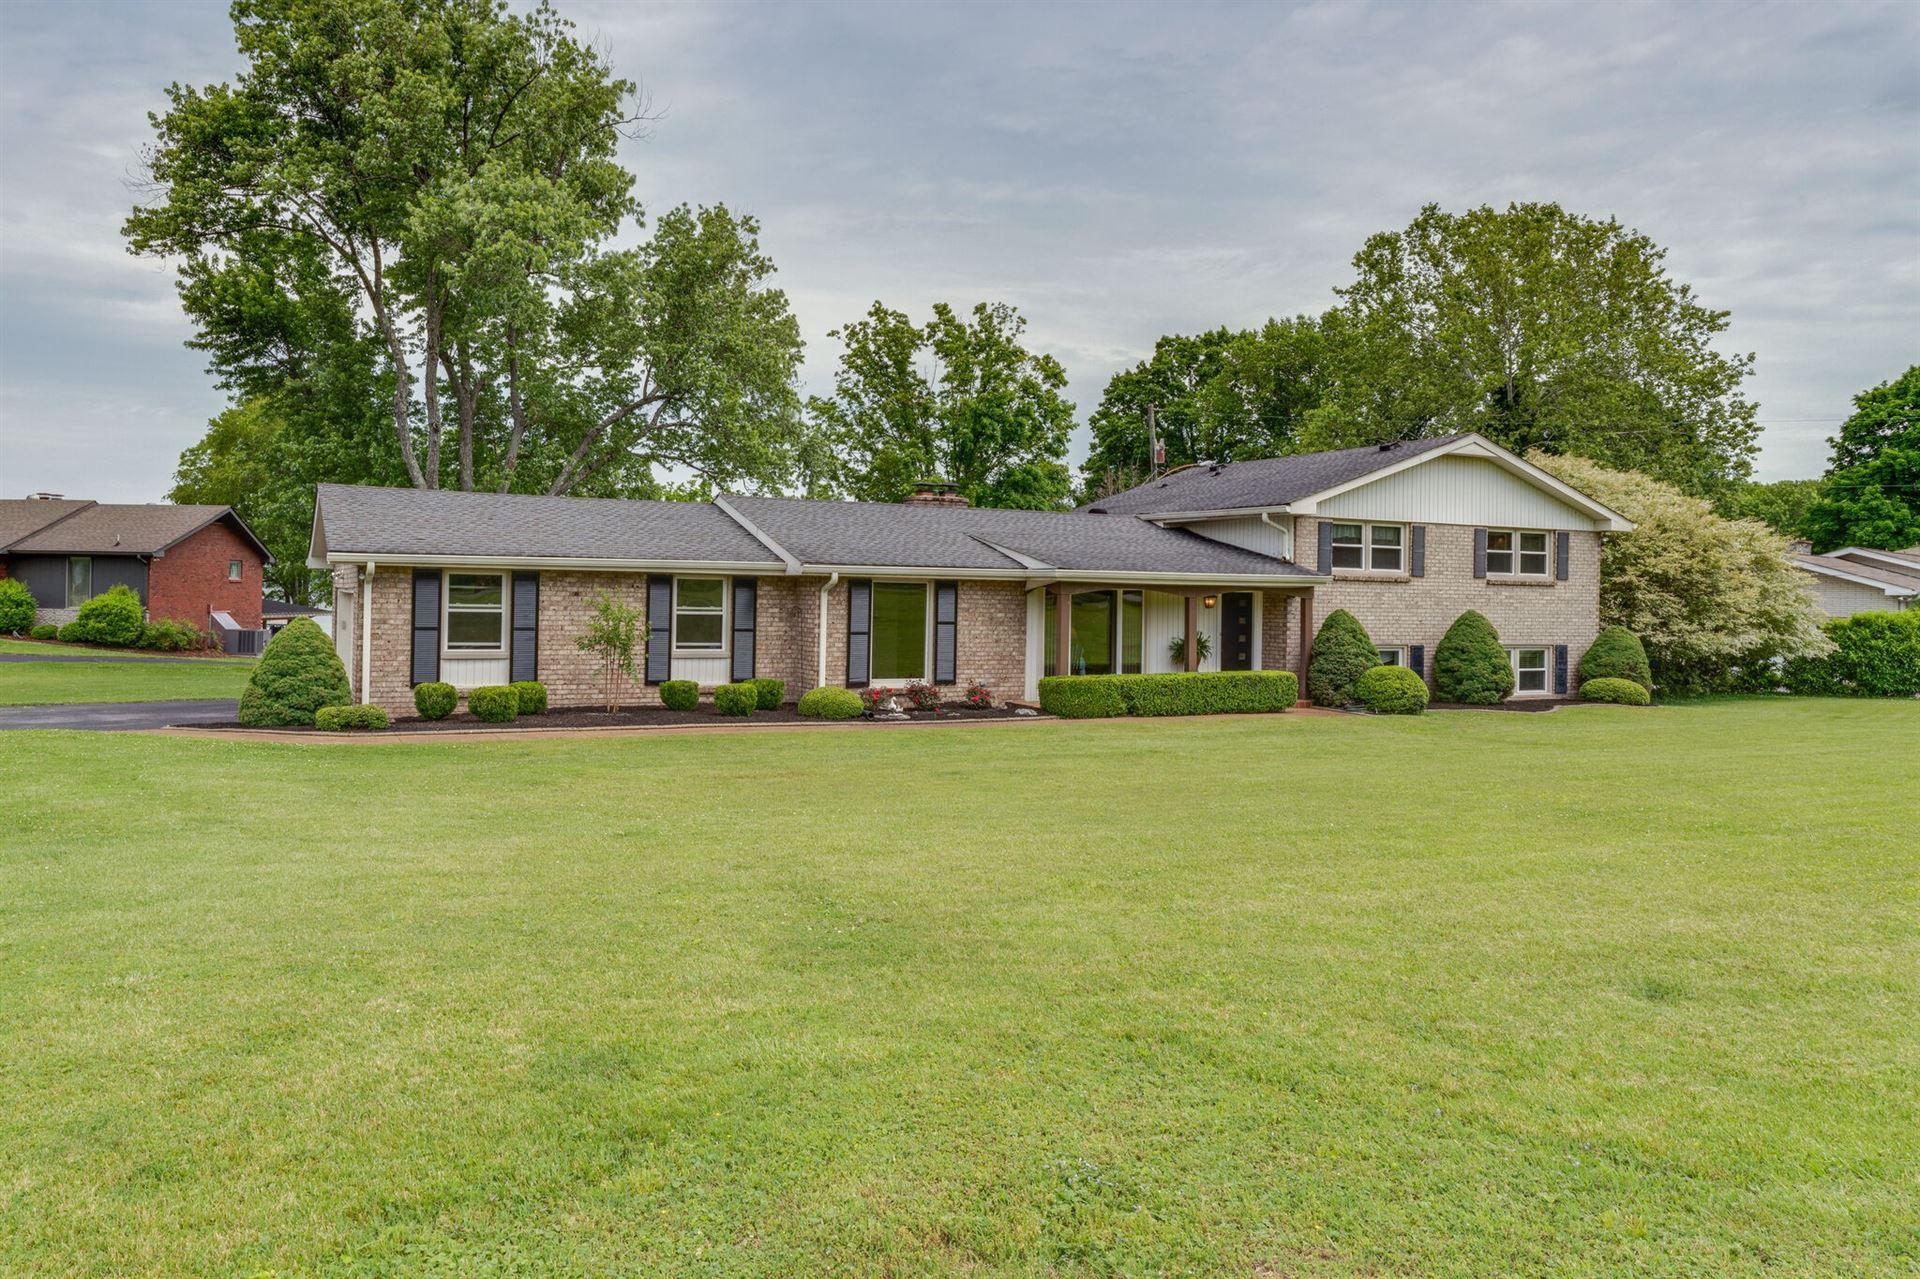 270 Lake Terrace Dr, Hendersonville, TN 37075 - MLS#: 2257321